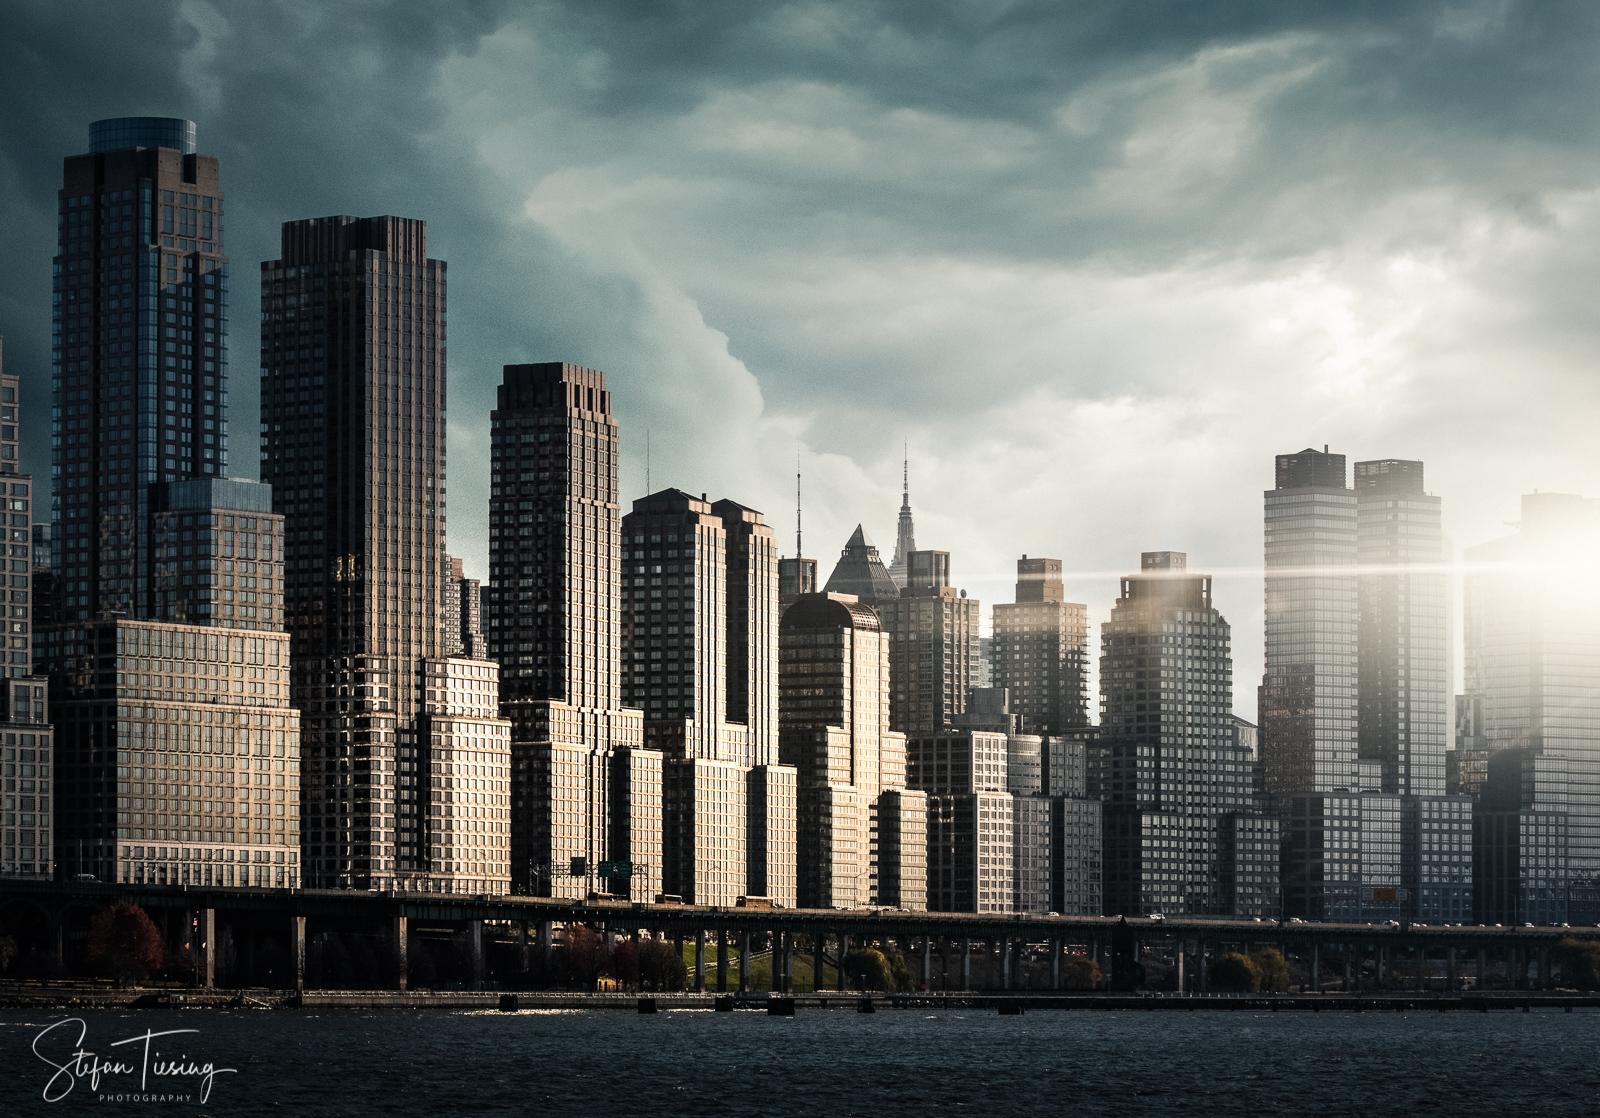 Upper West Side Skyline, USA